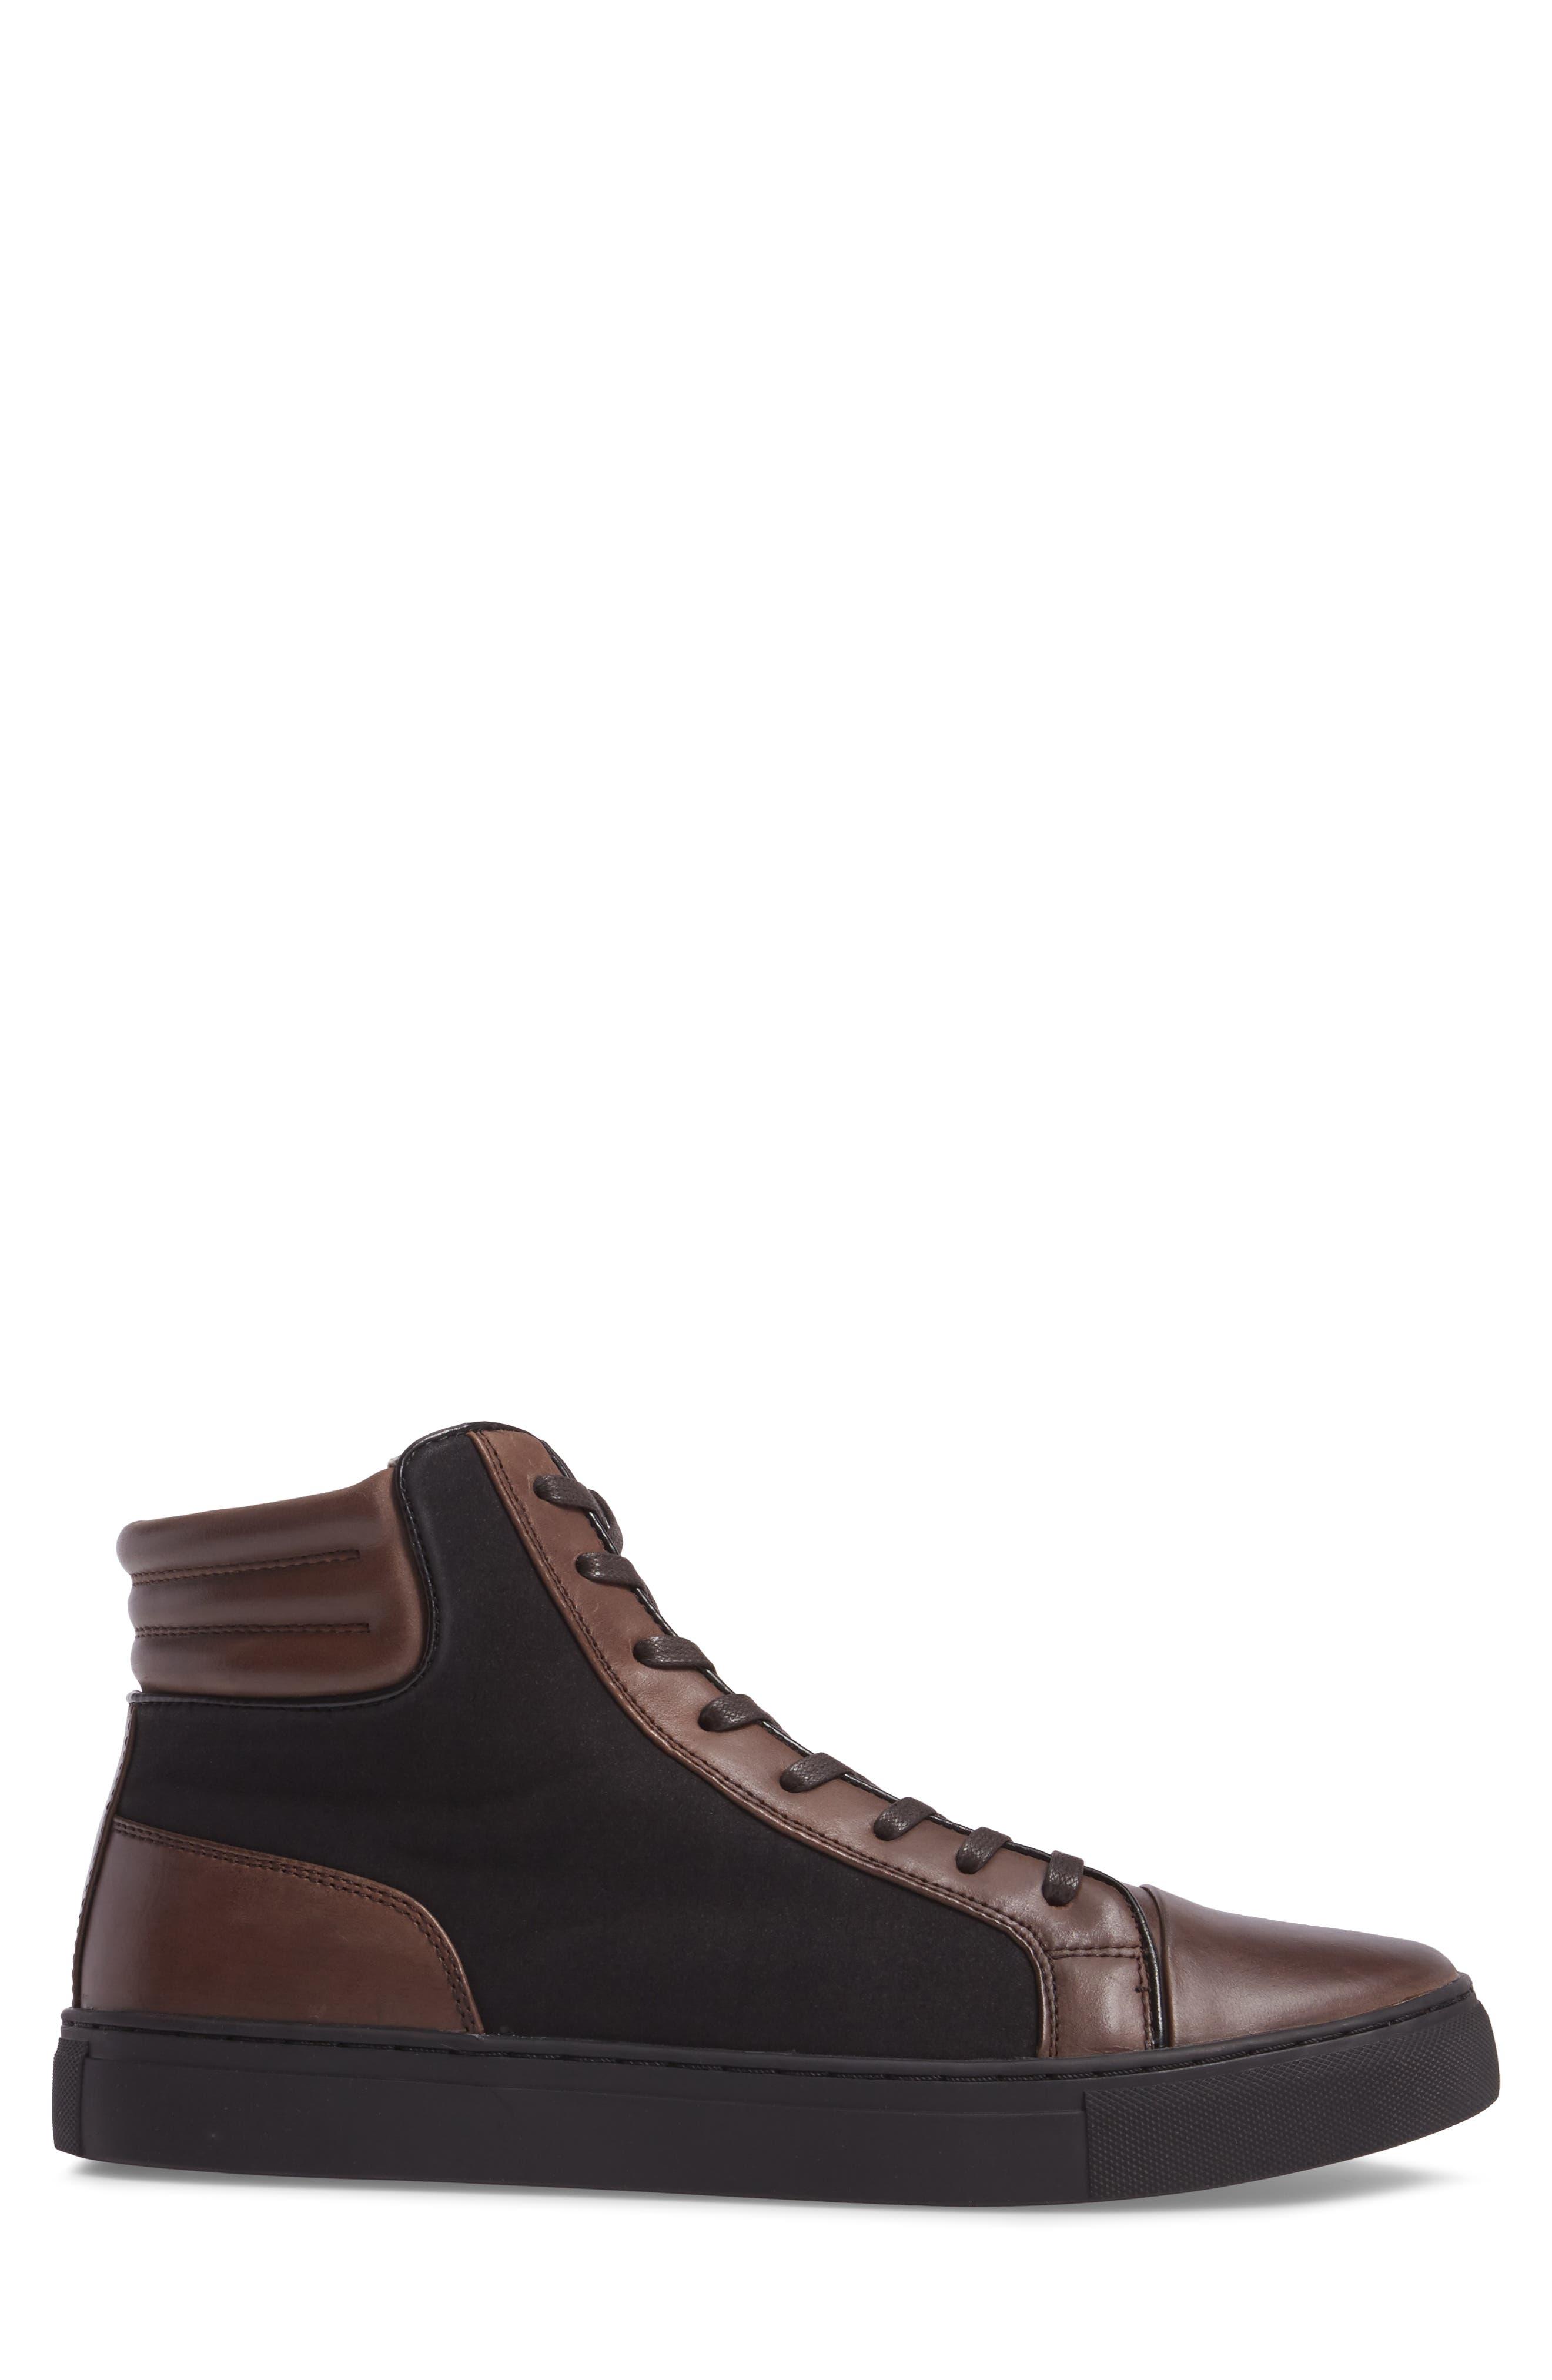 Kenneth Cole Reaction Sneaker,                             Alternate thumbnail 3, color,